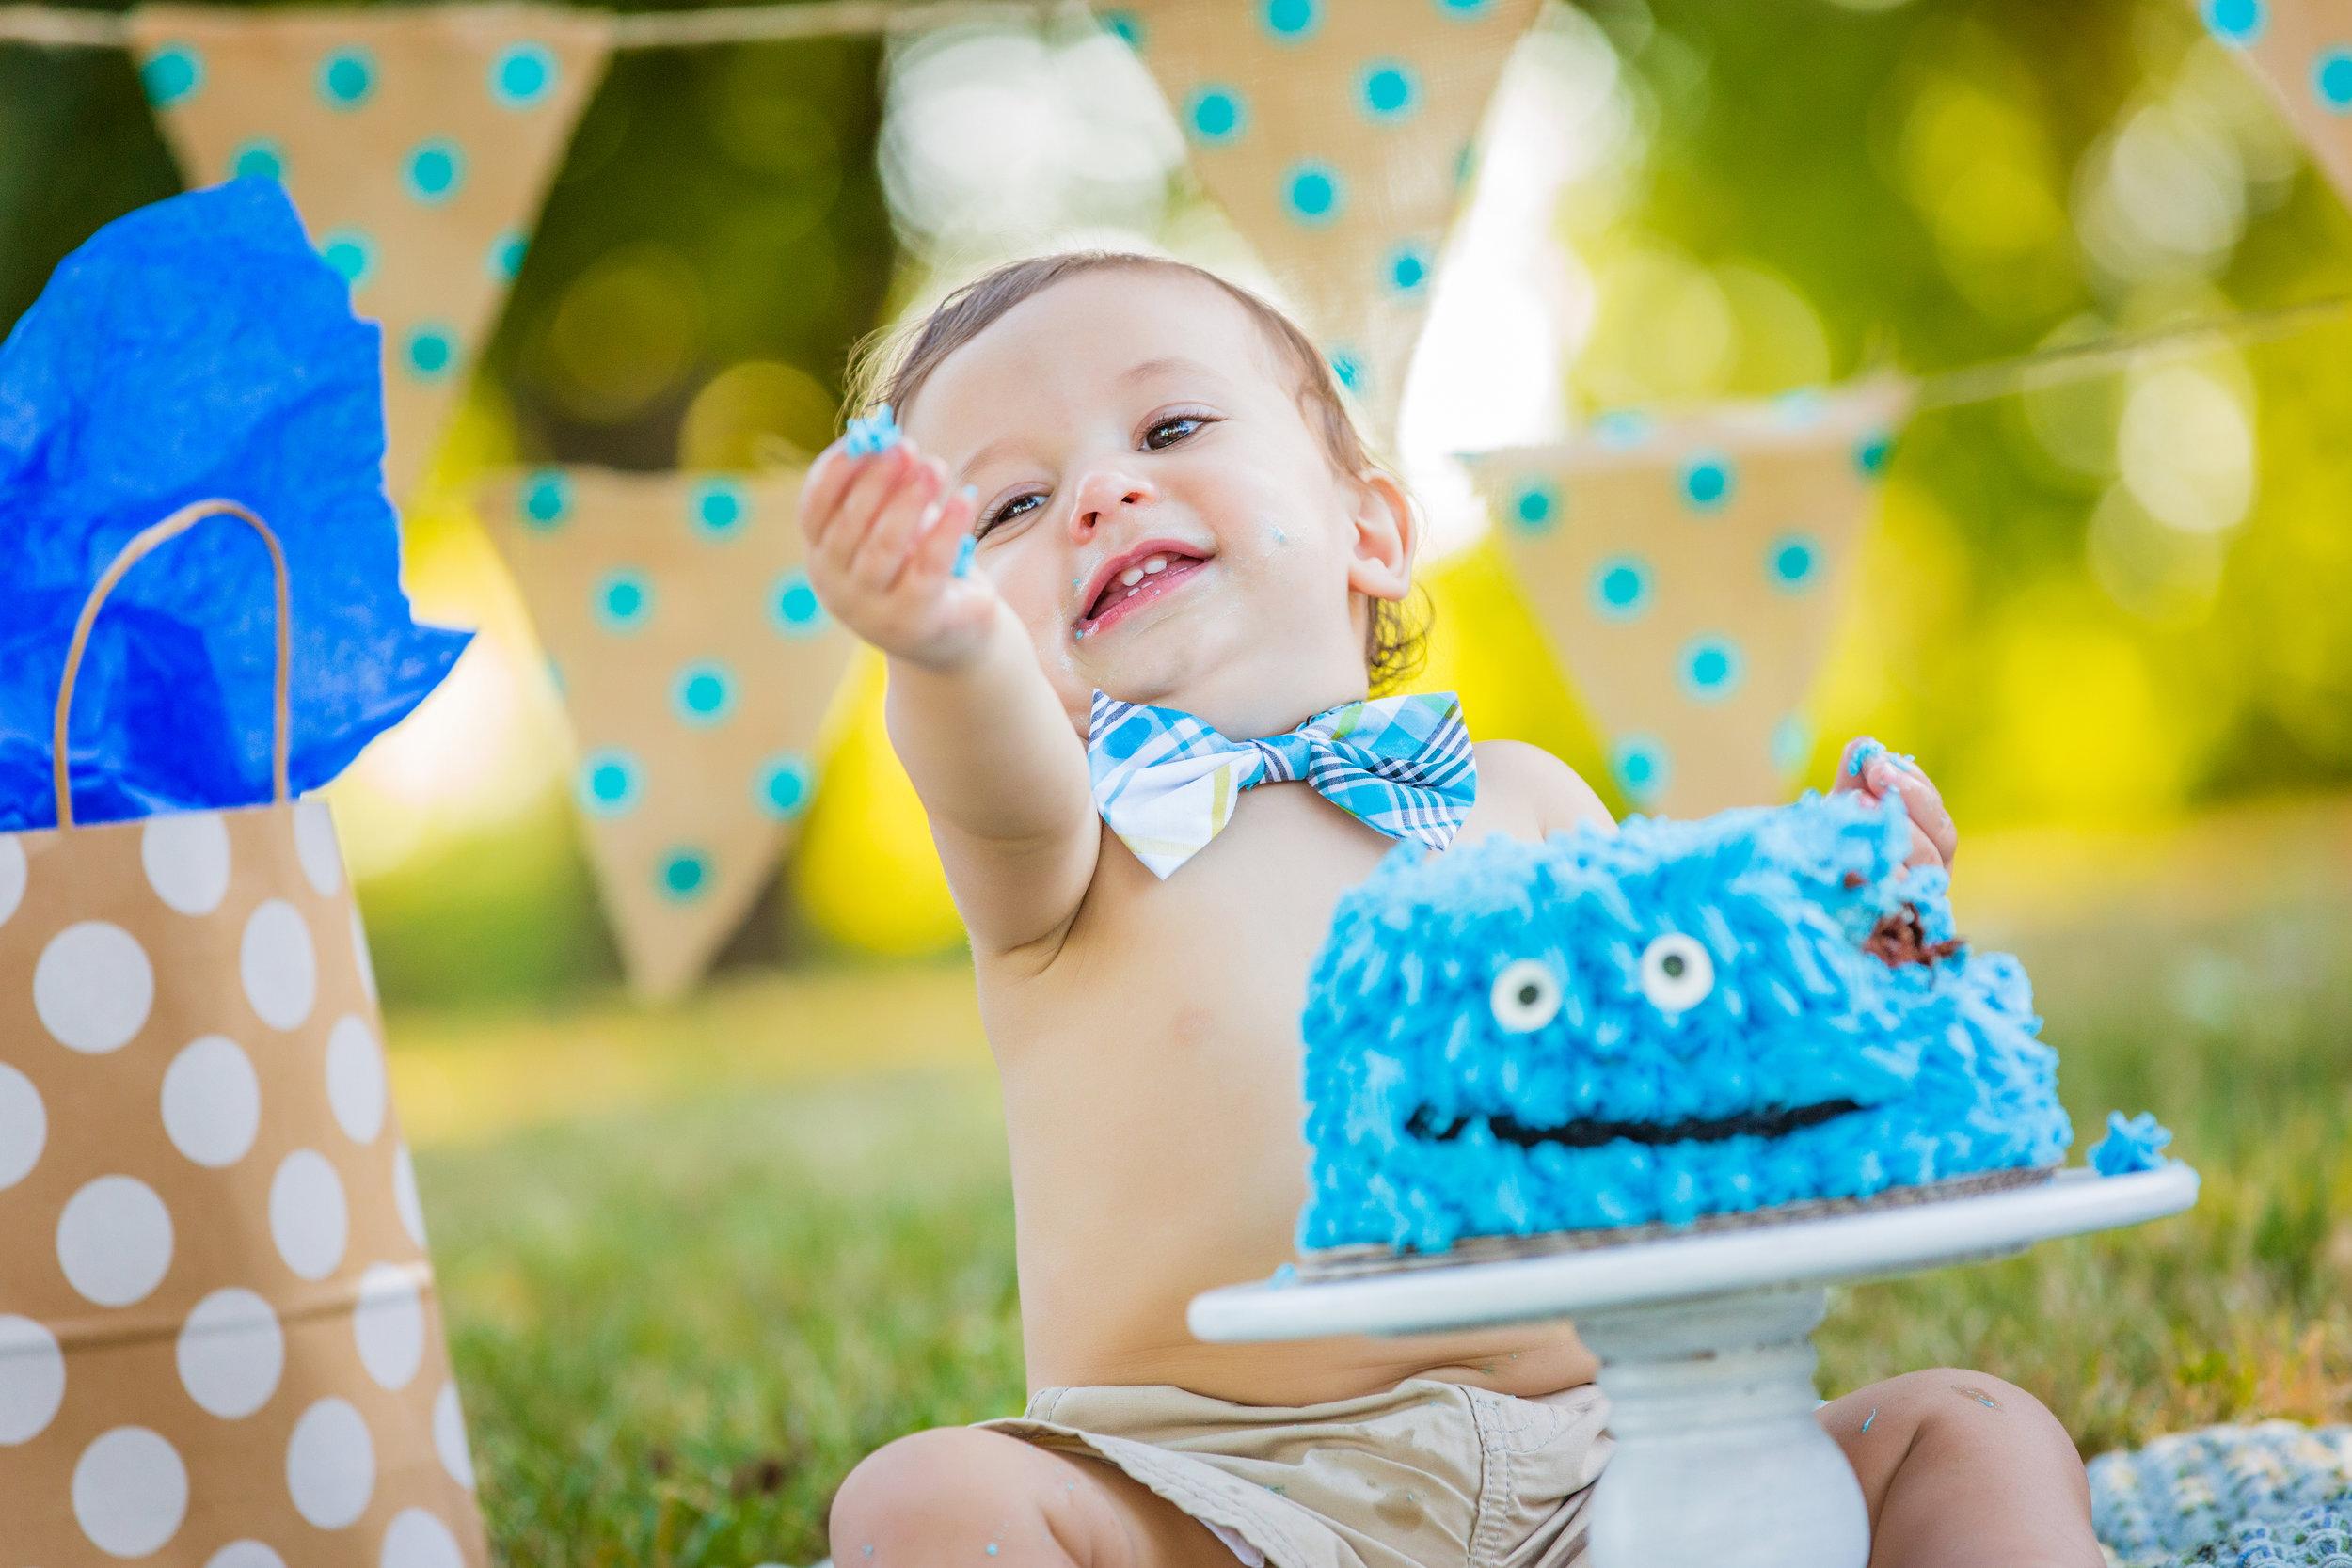 Smash cake baby